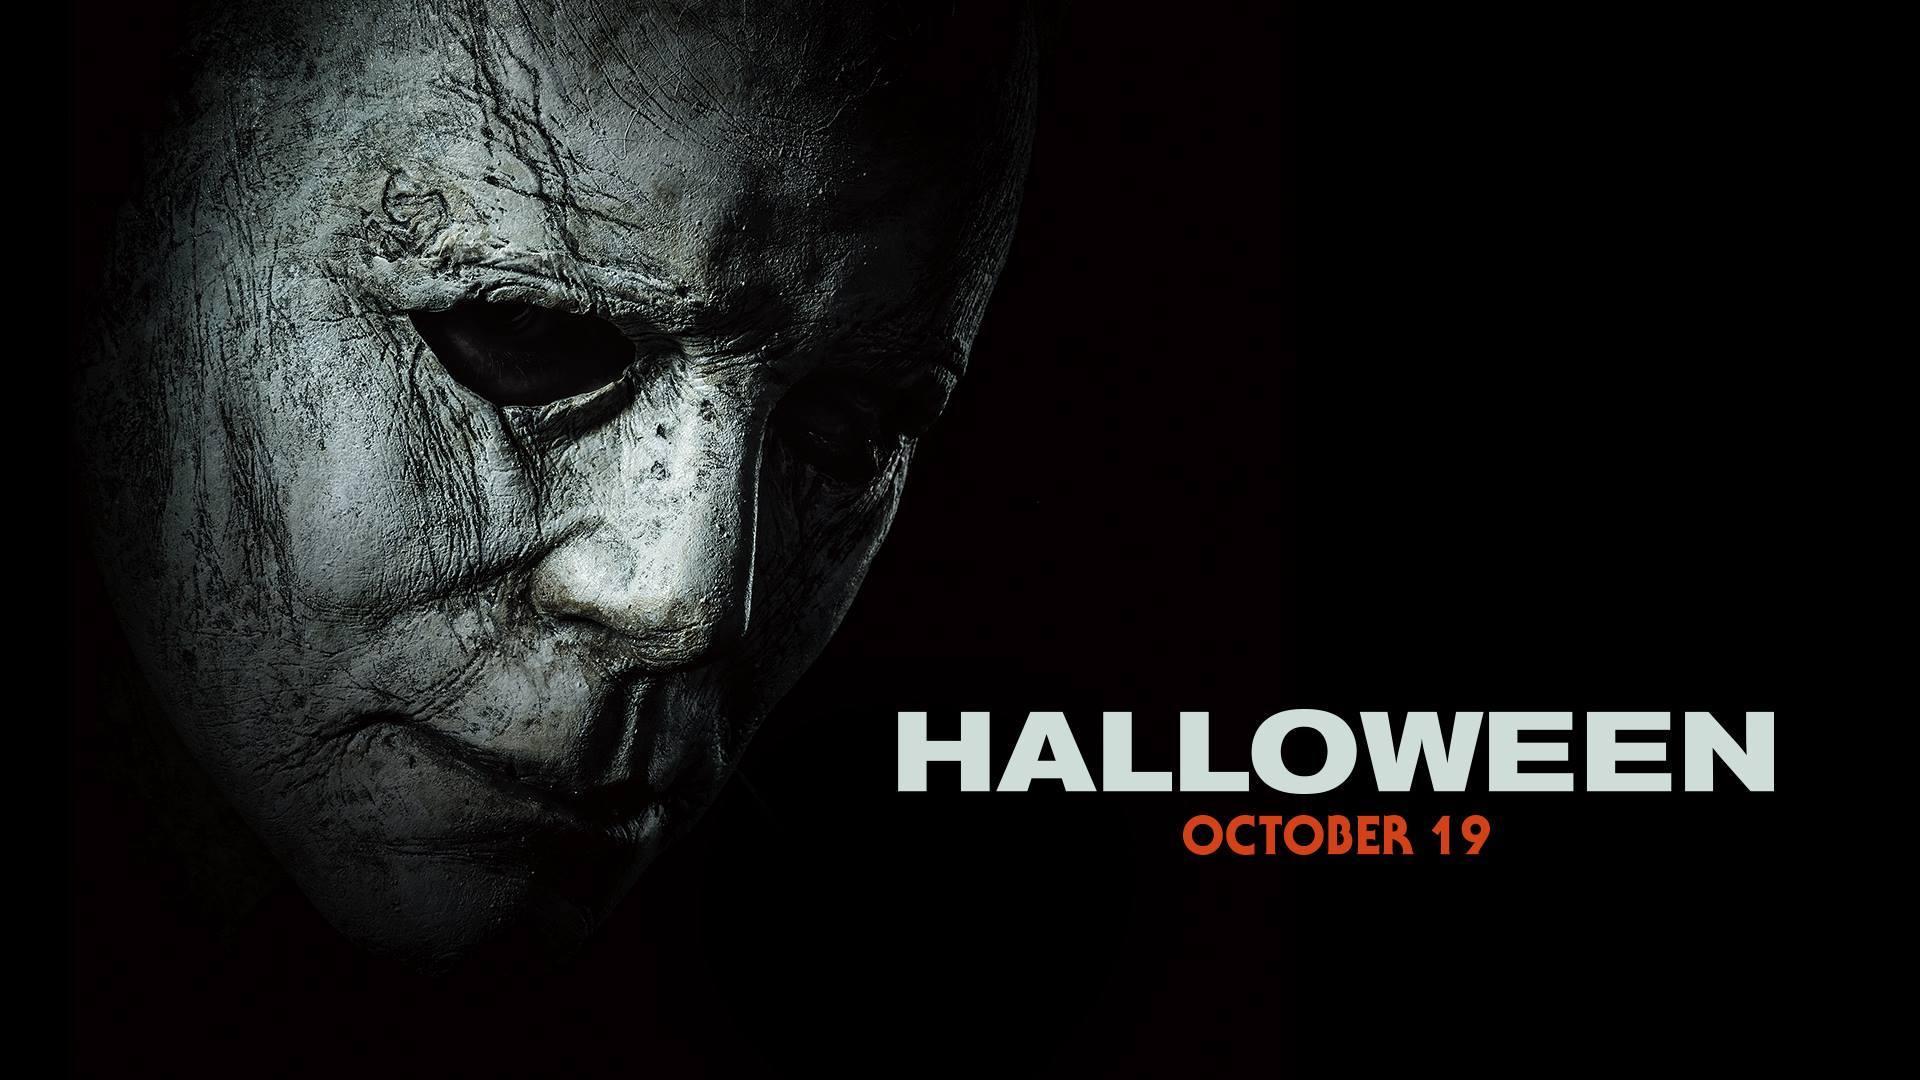 http://www.globalwebdirectorylist.com/wp-content/uploads/2018/10/Halloween-2018.jpg